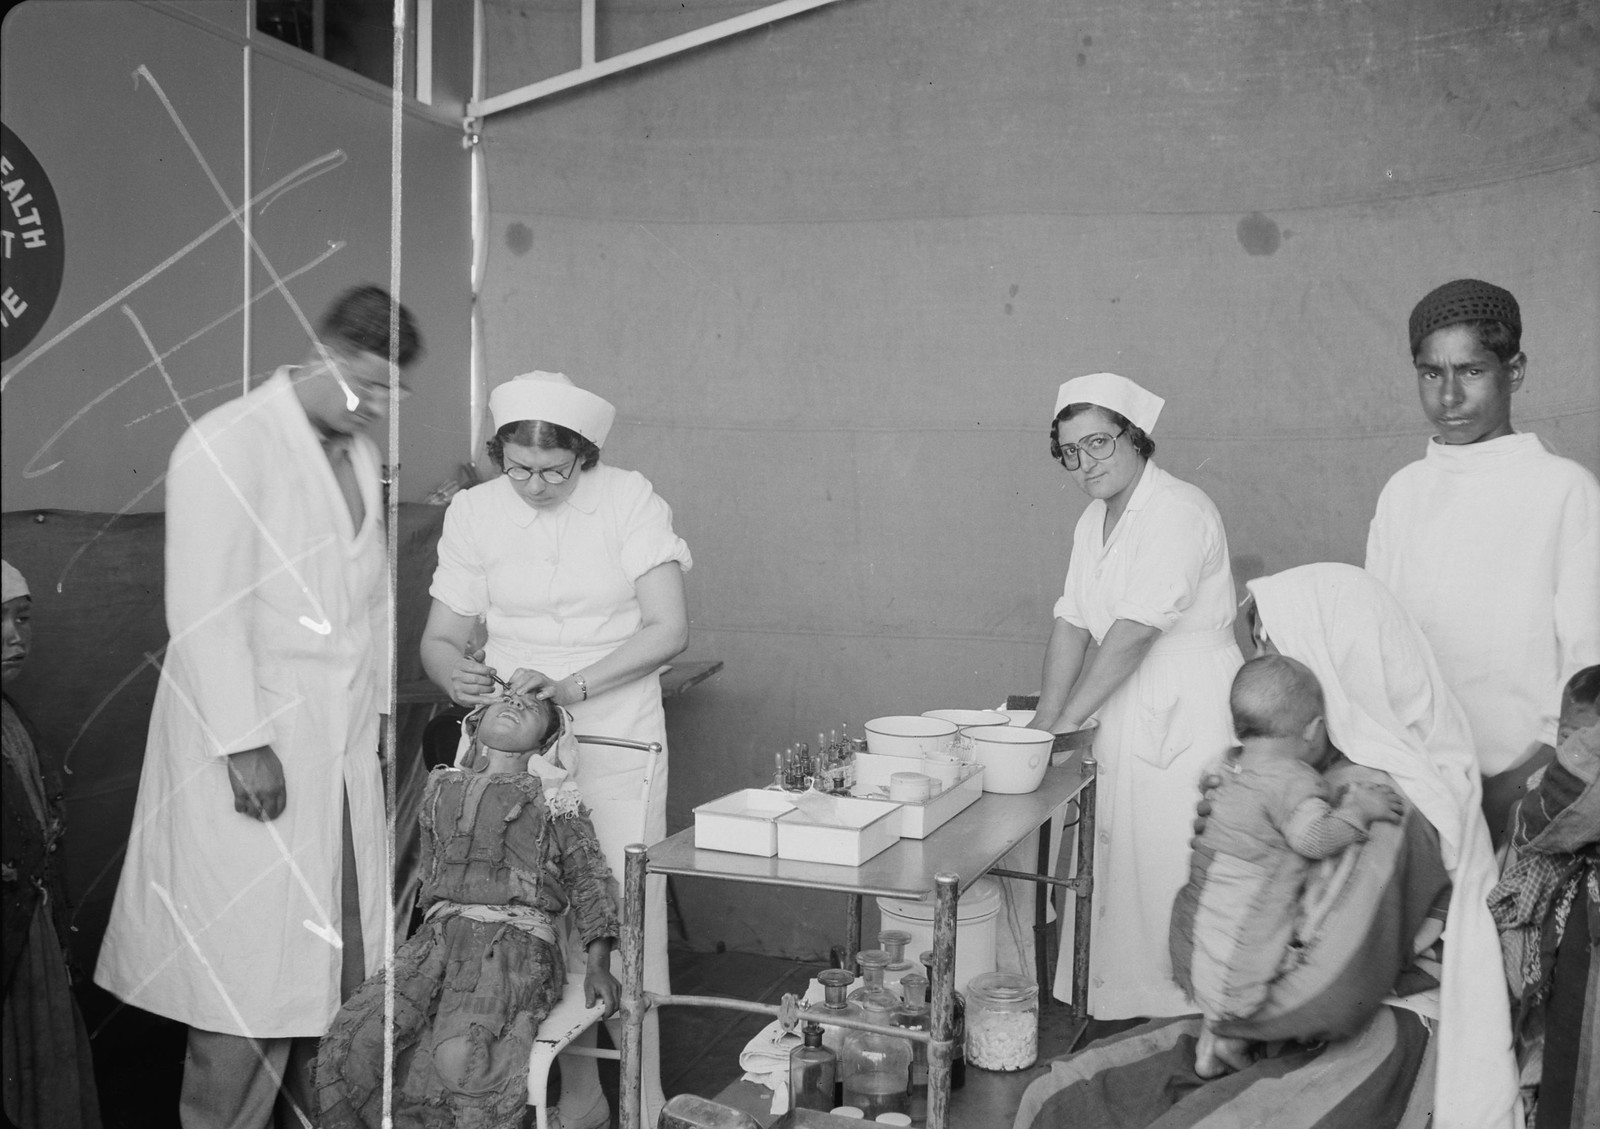 Медсестры проводят проверку глаз